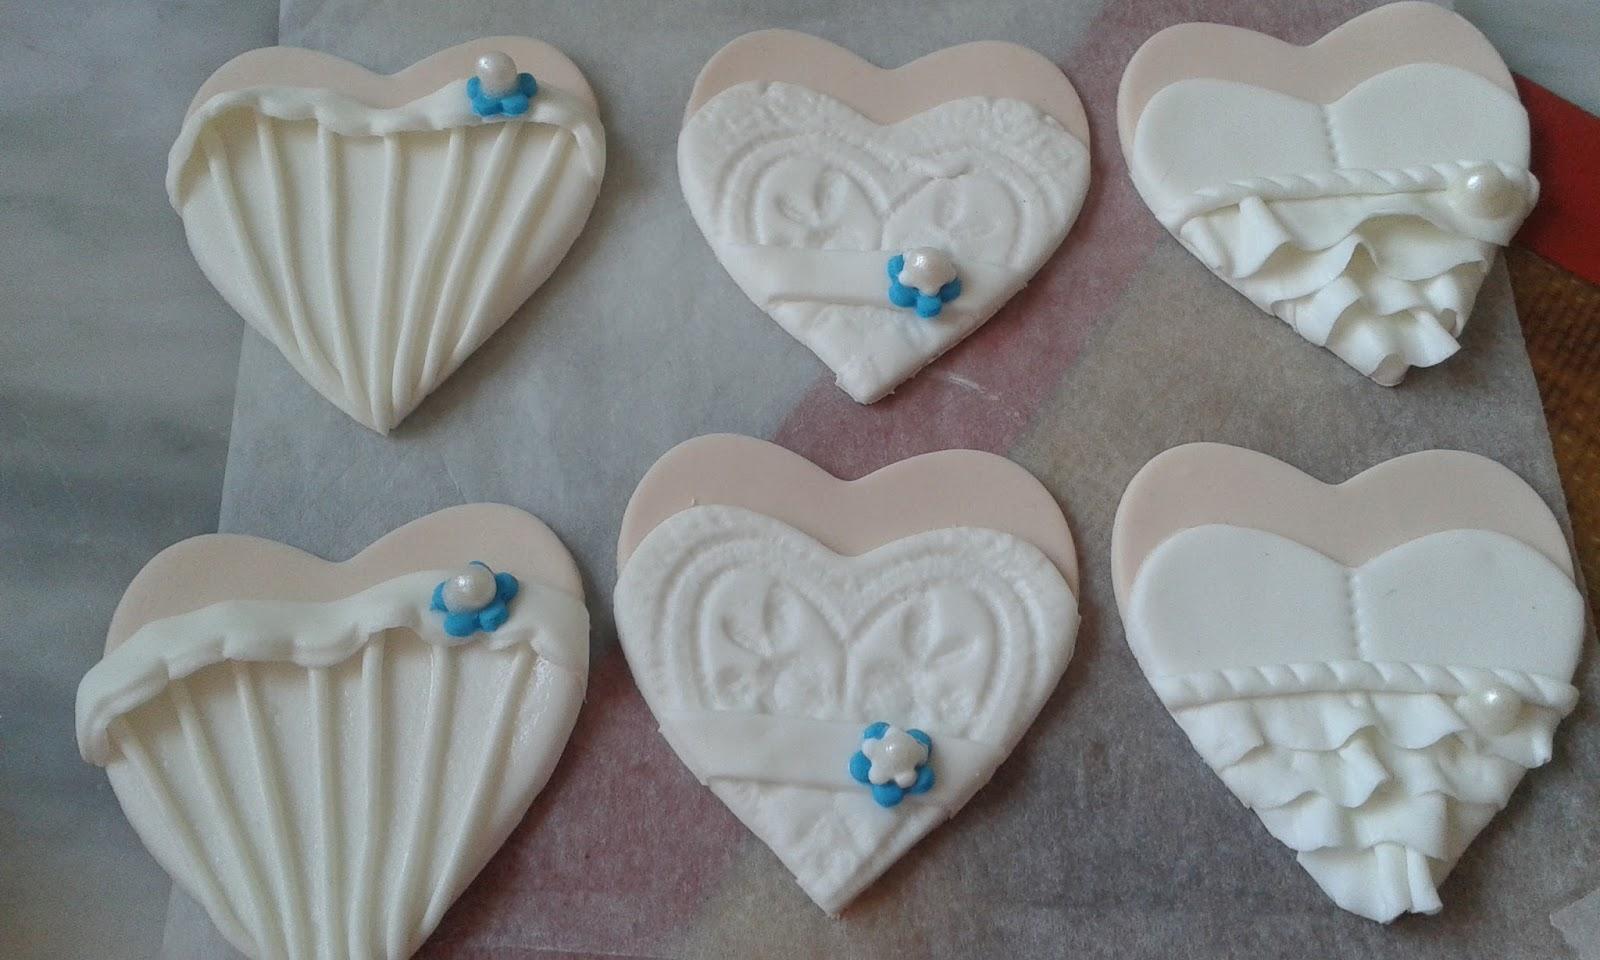 Cupcakes tenerife galletas de boda - Cupcakes tenerife ...